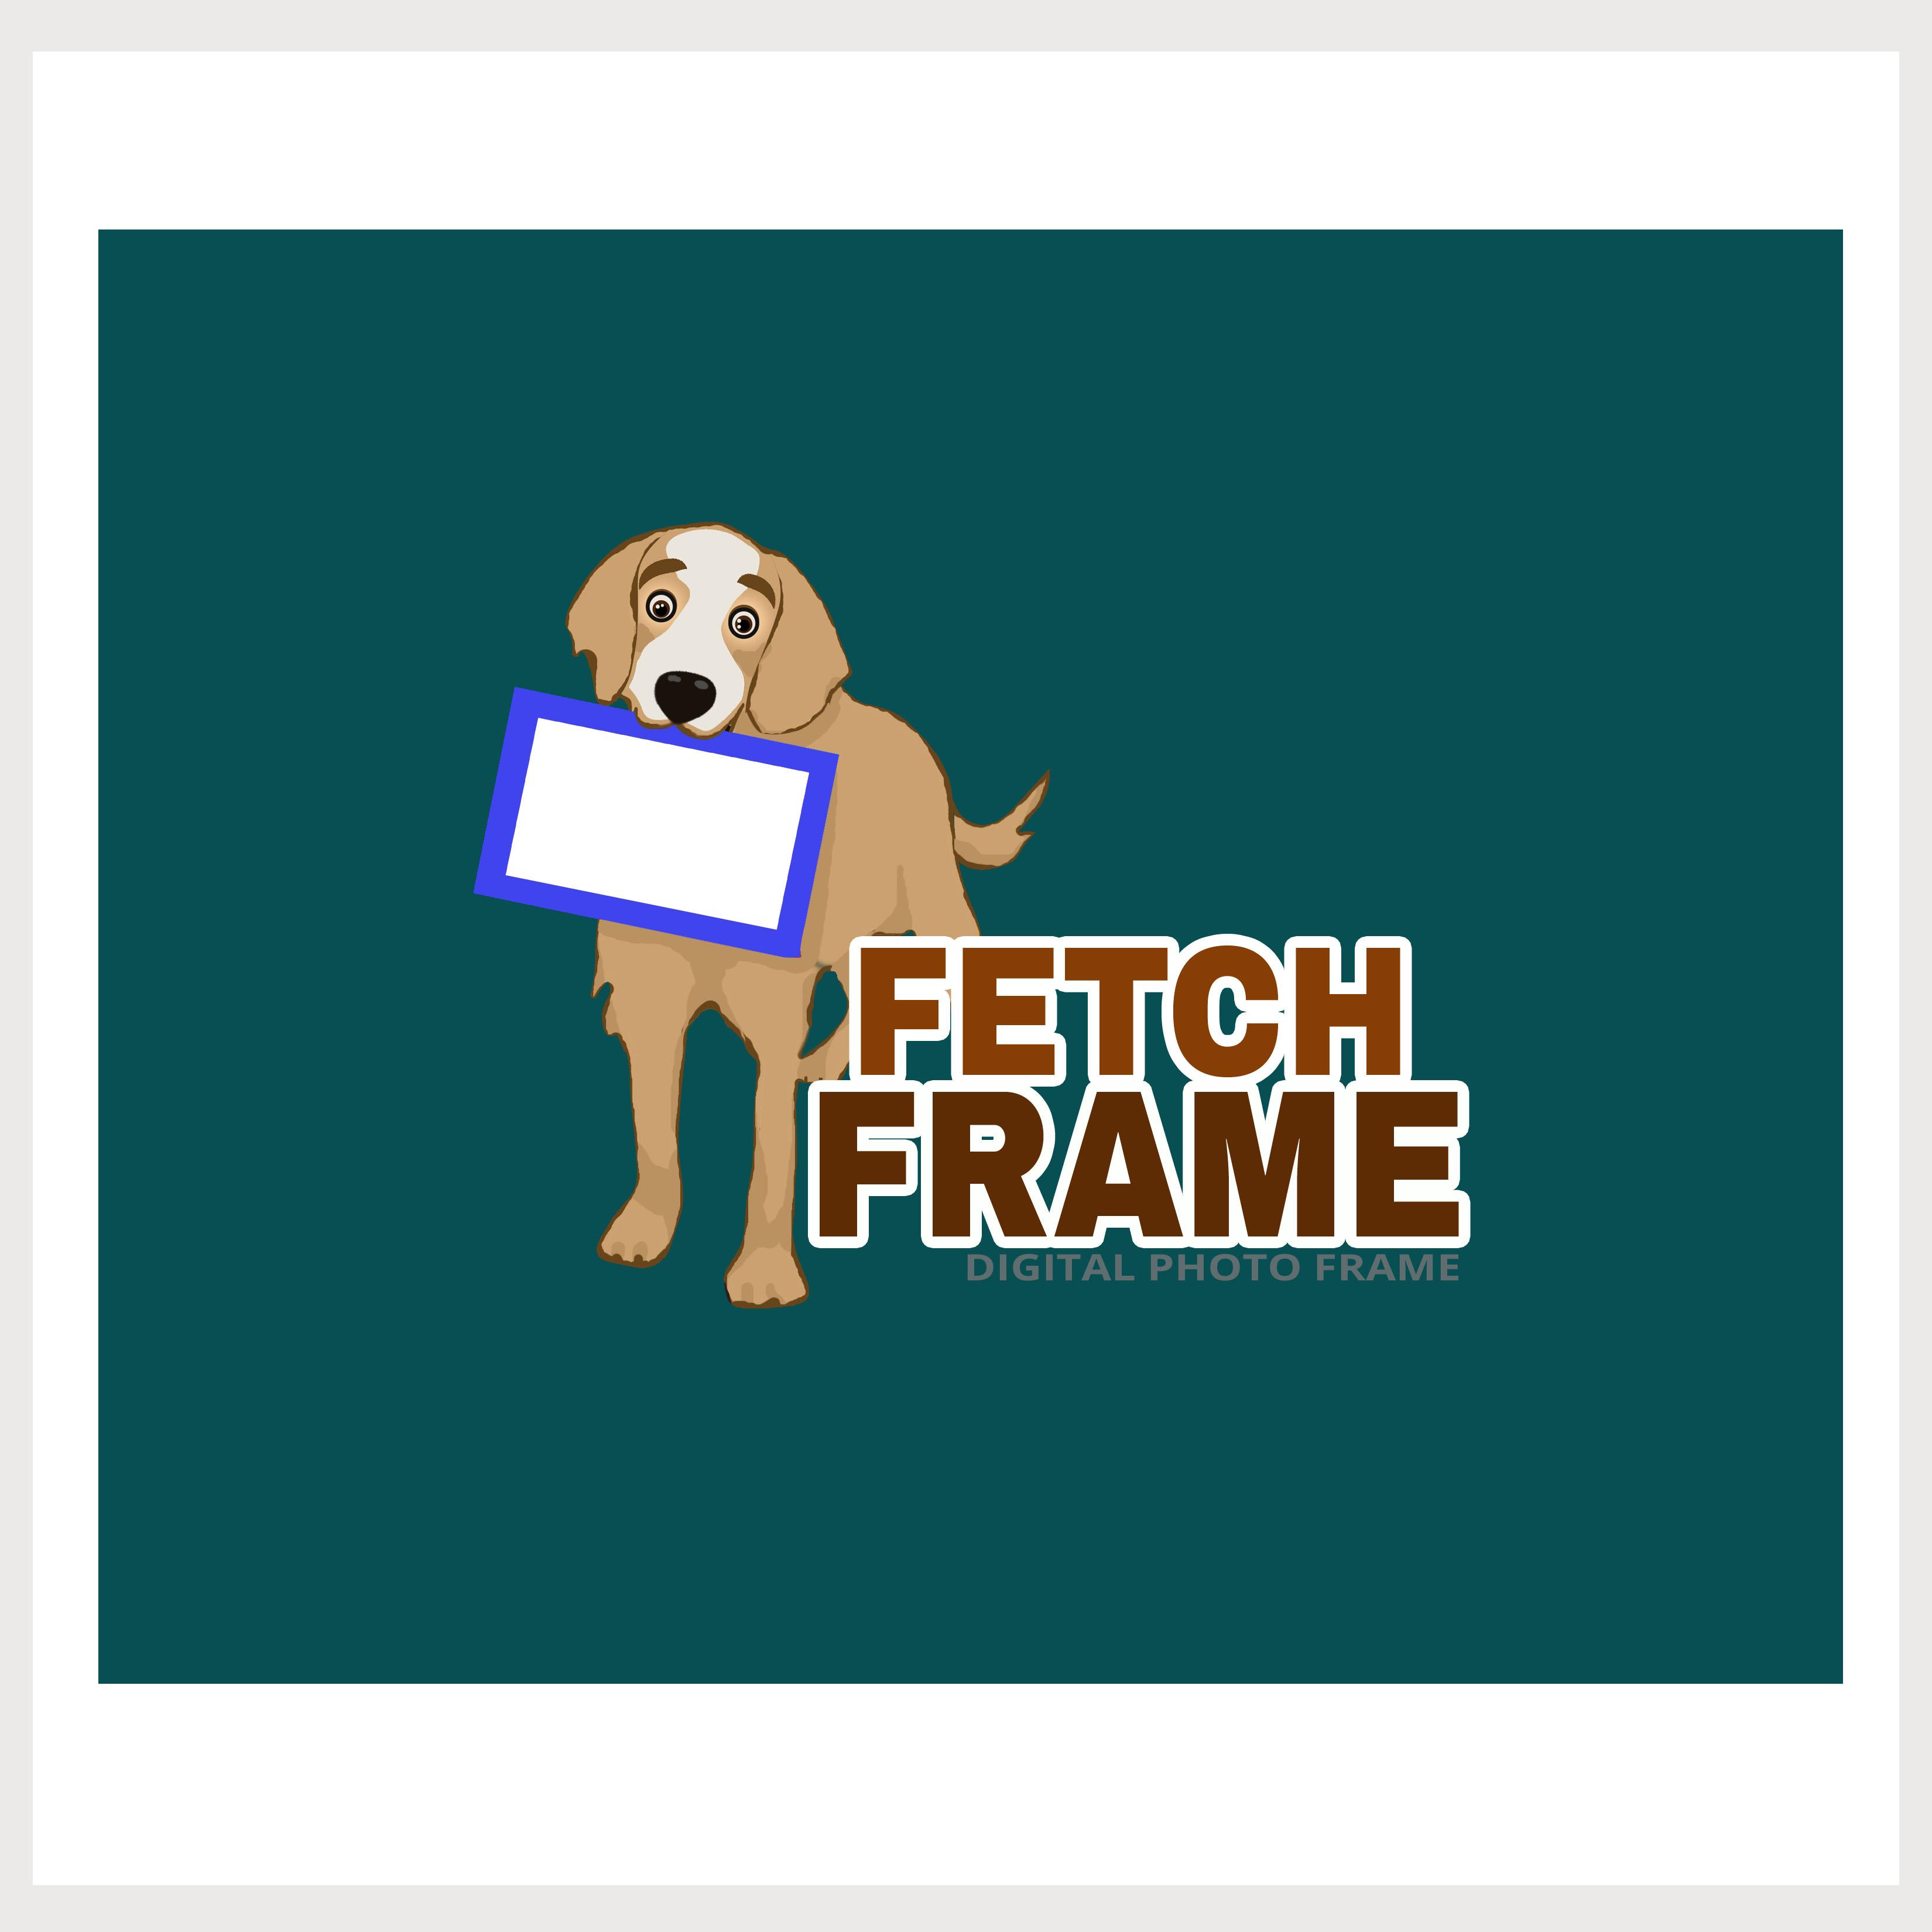 Logo Design by Allan Esclamado - Entry No. 87 in the Logo Design Contest New Logo Design for FetchFrame.